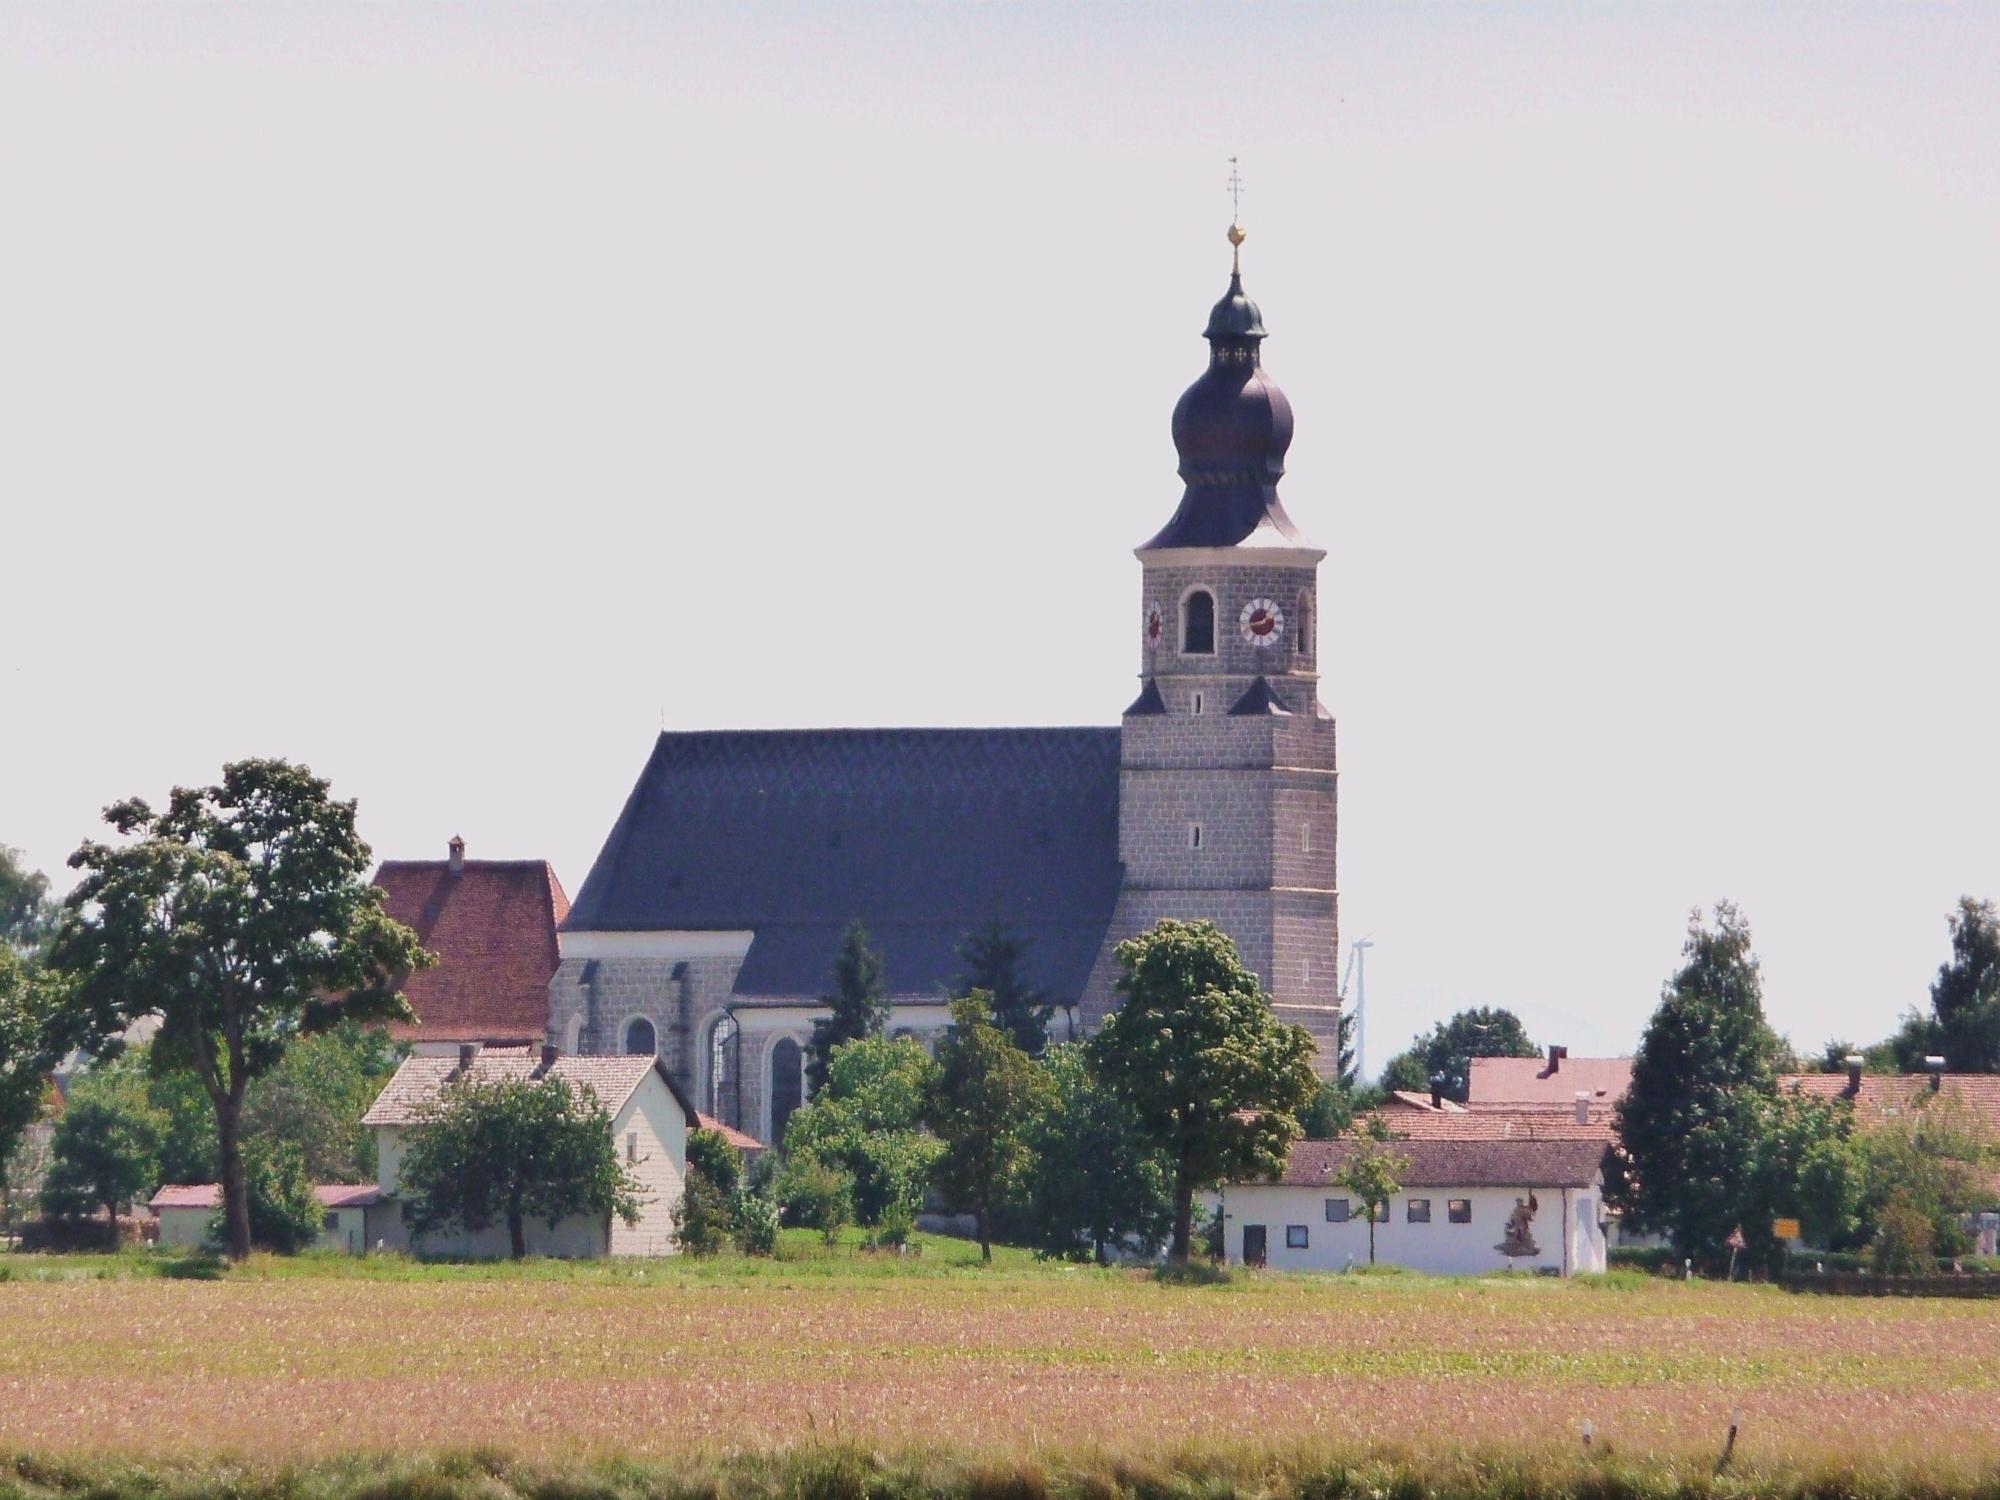 Pfarrkirche Feichten an der Alz